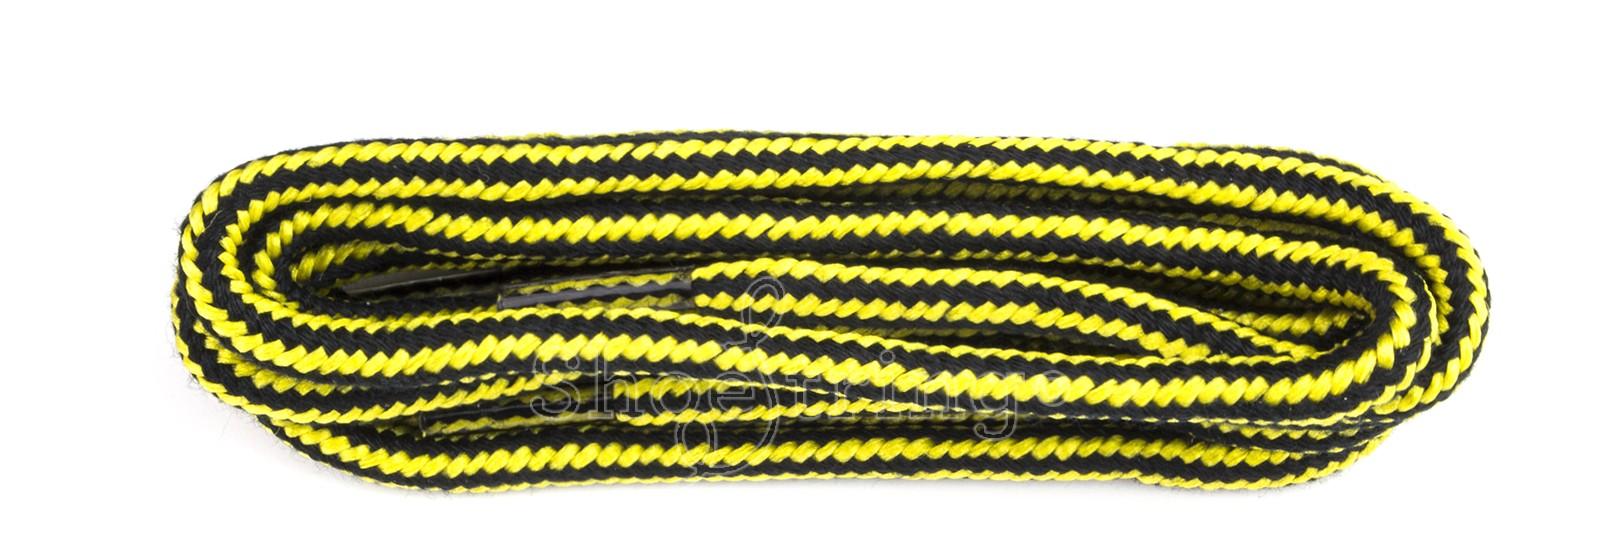 Kicker Dark Round Cord Laces